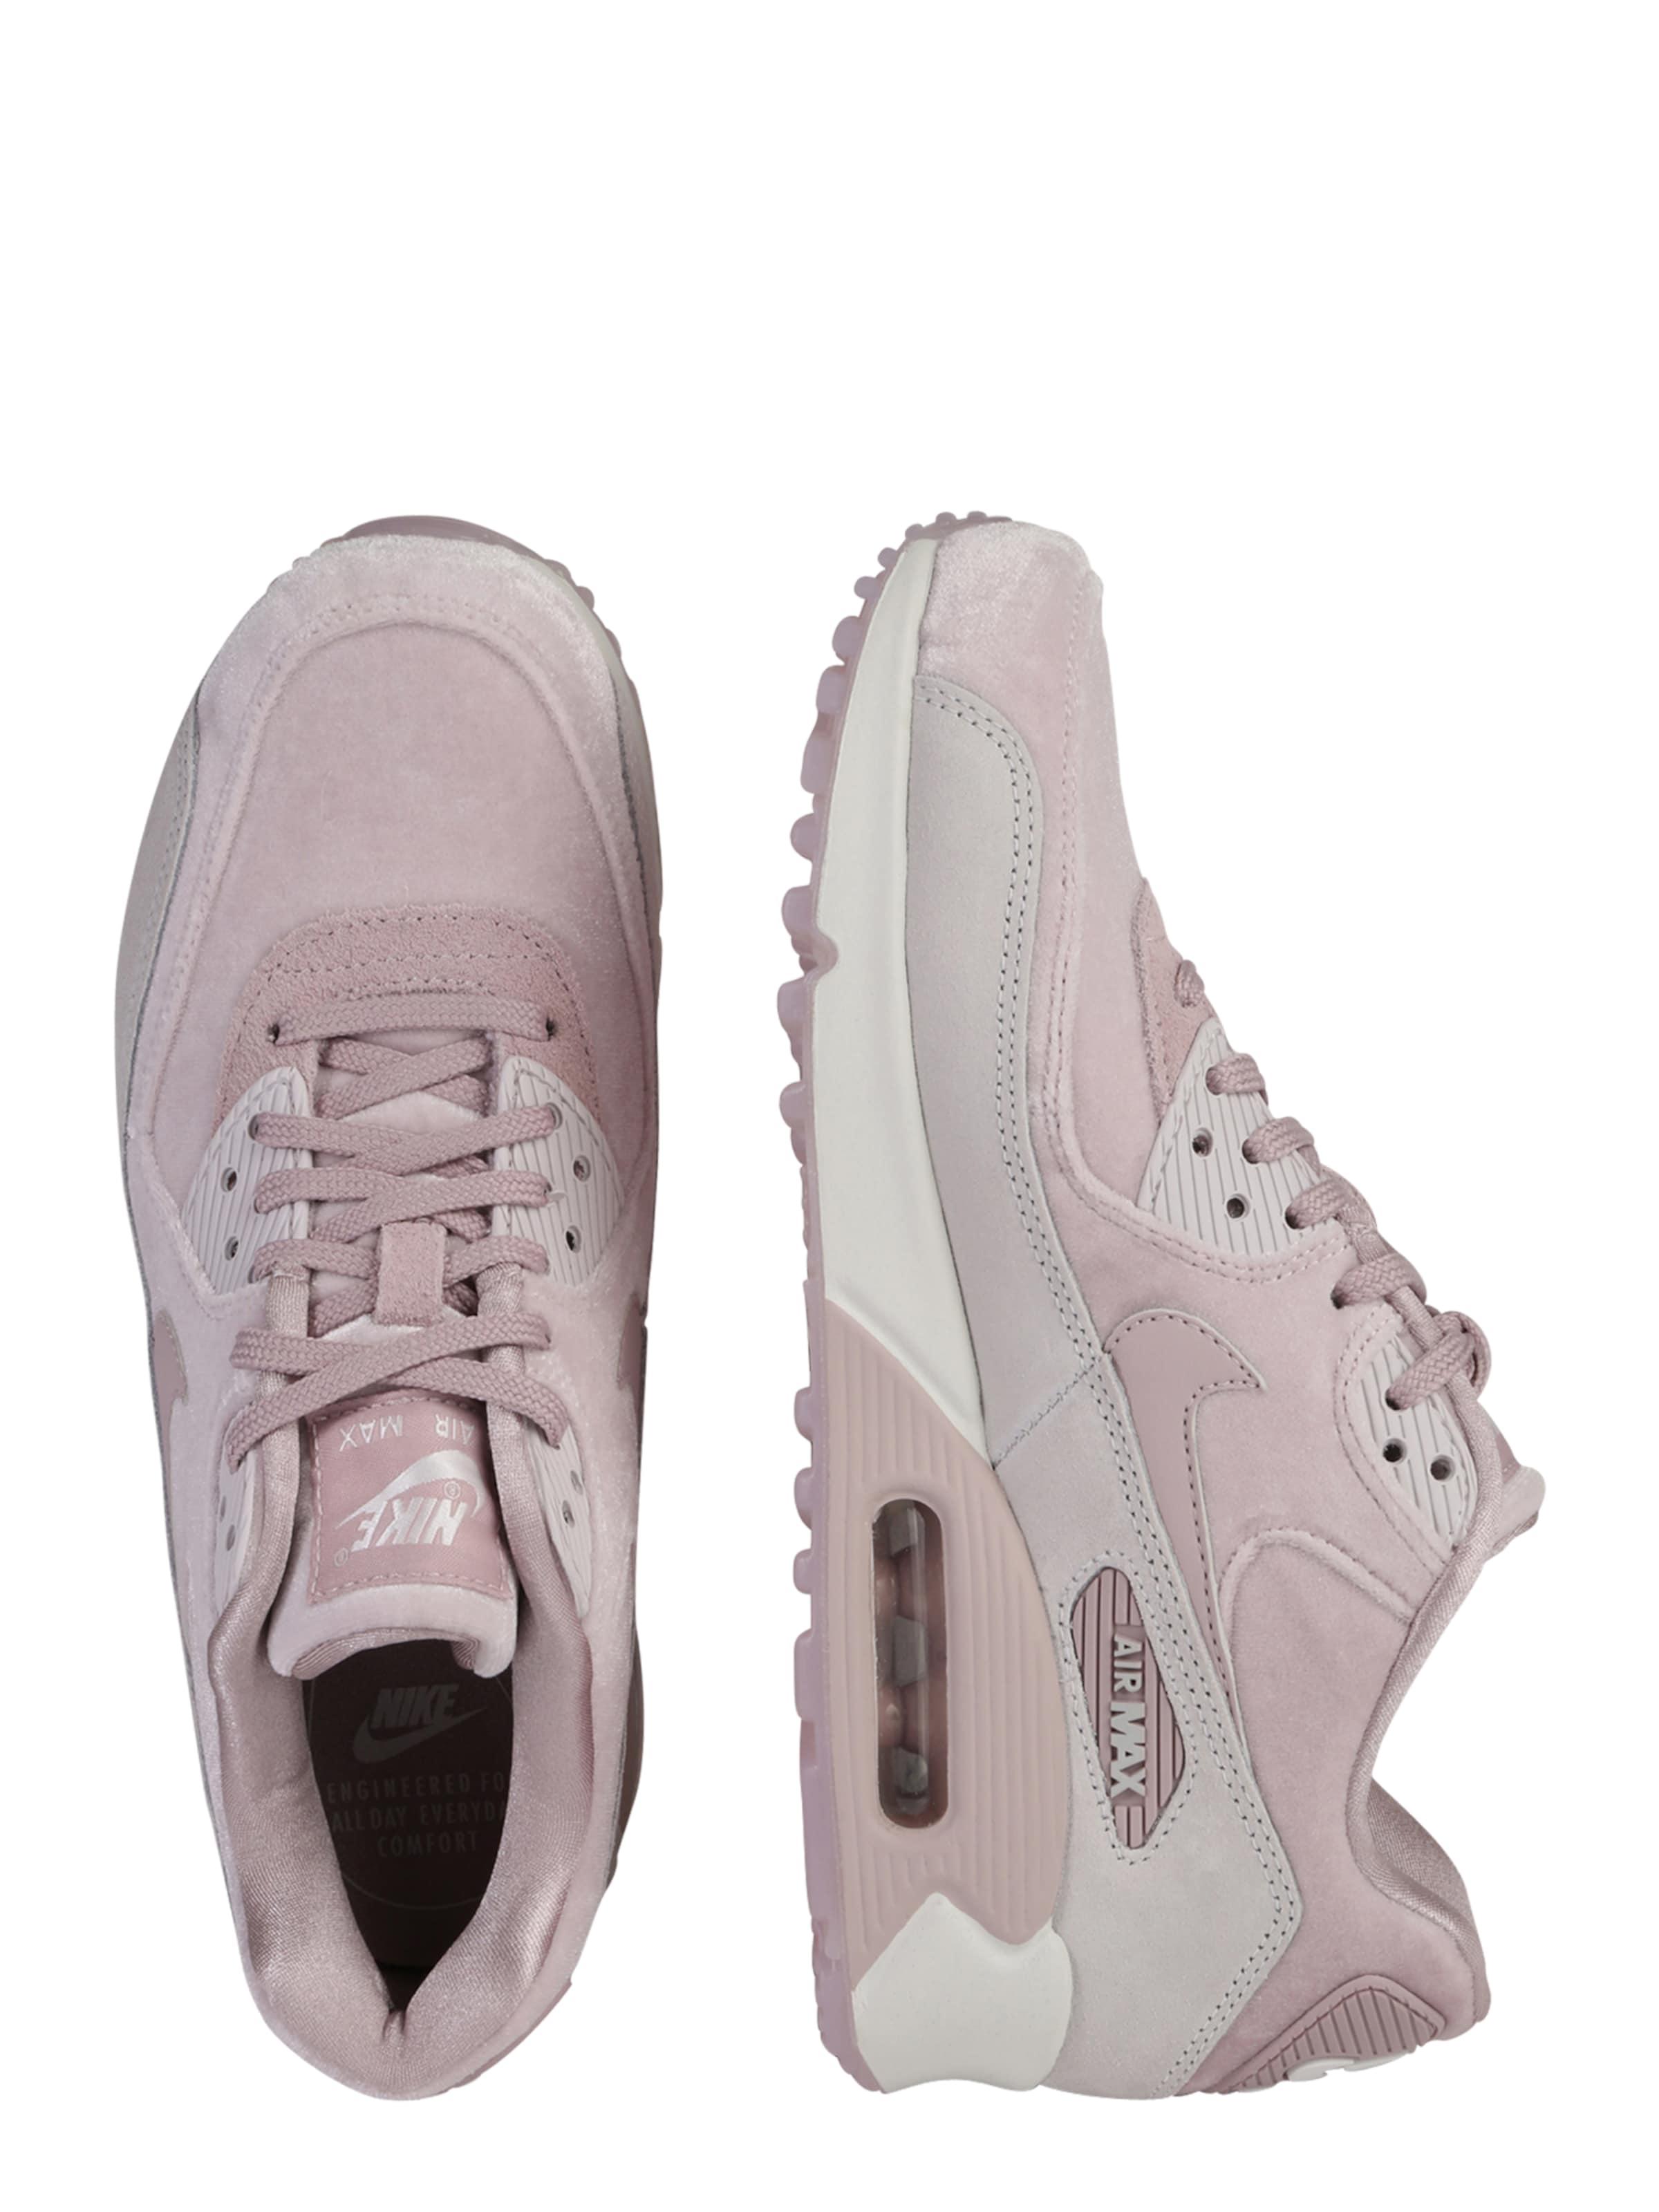 Nike Sportswear Sneaker 'Air Max 90 LX' Rabatt Aus Deutschland Offiziell bcddbv8